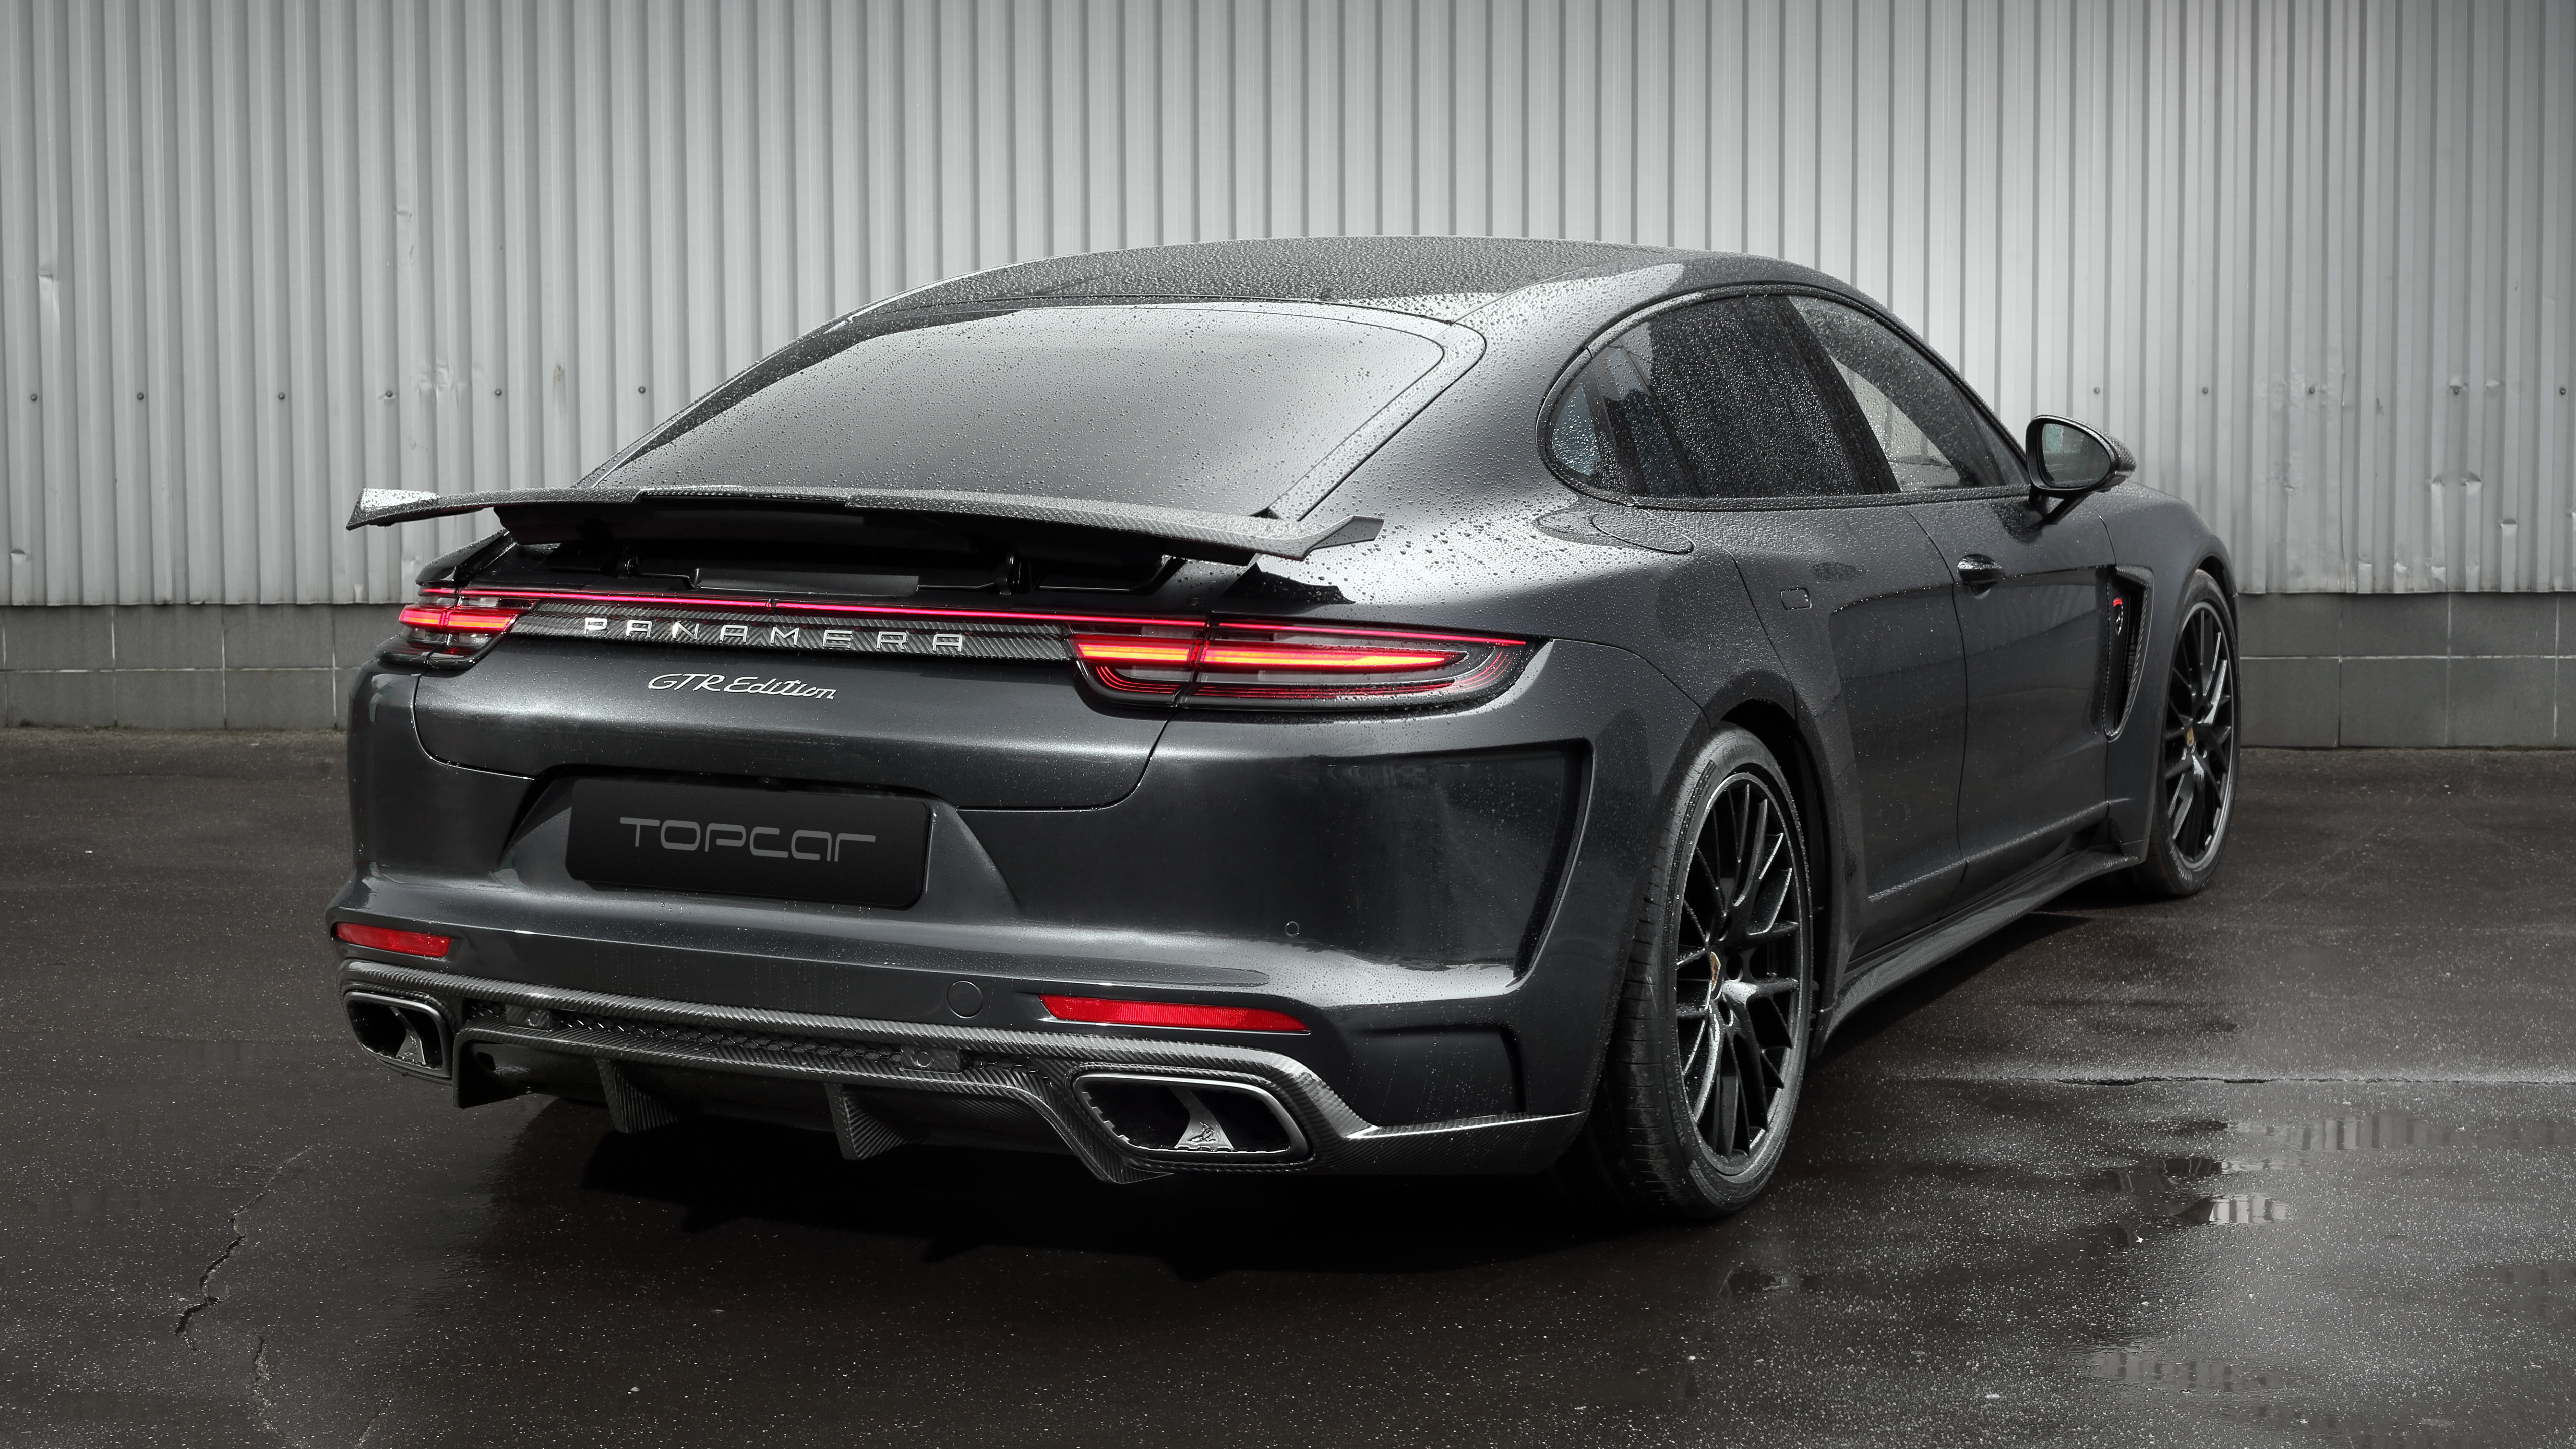 TopCar Porsche Panamera GTR Edition 2019 4K 3 Wallpaper ...